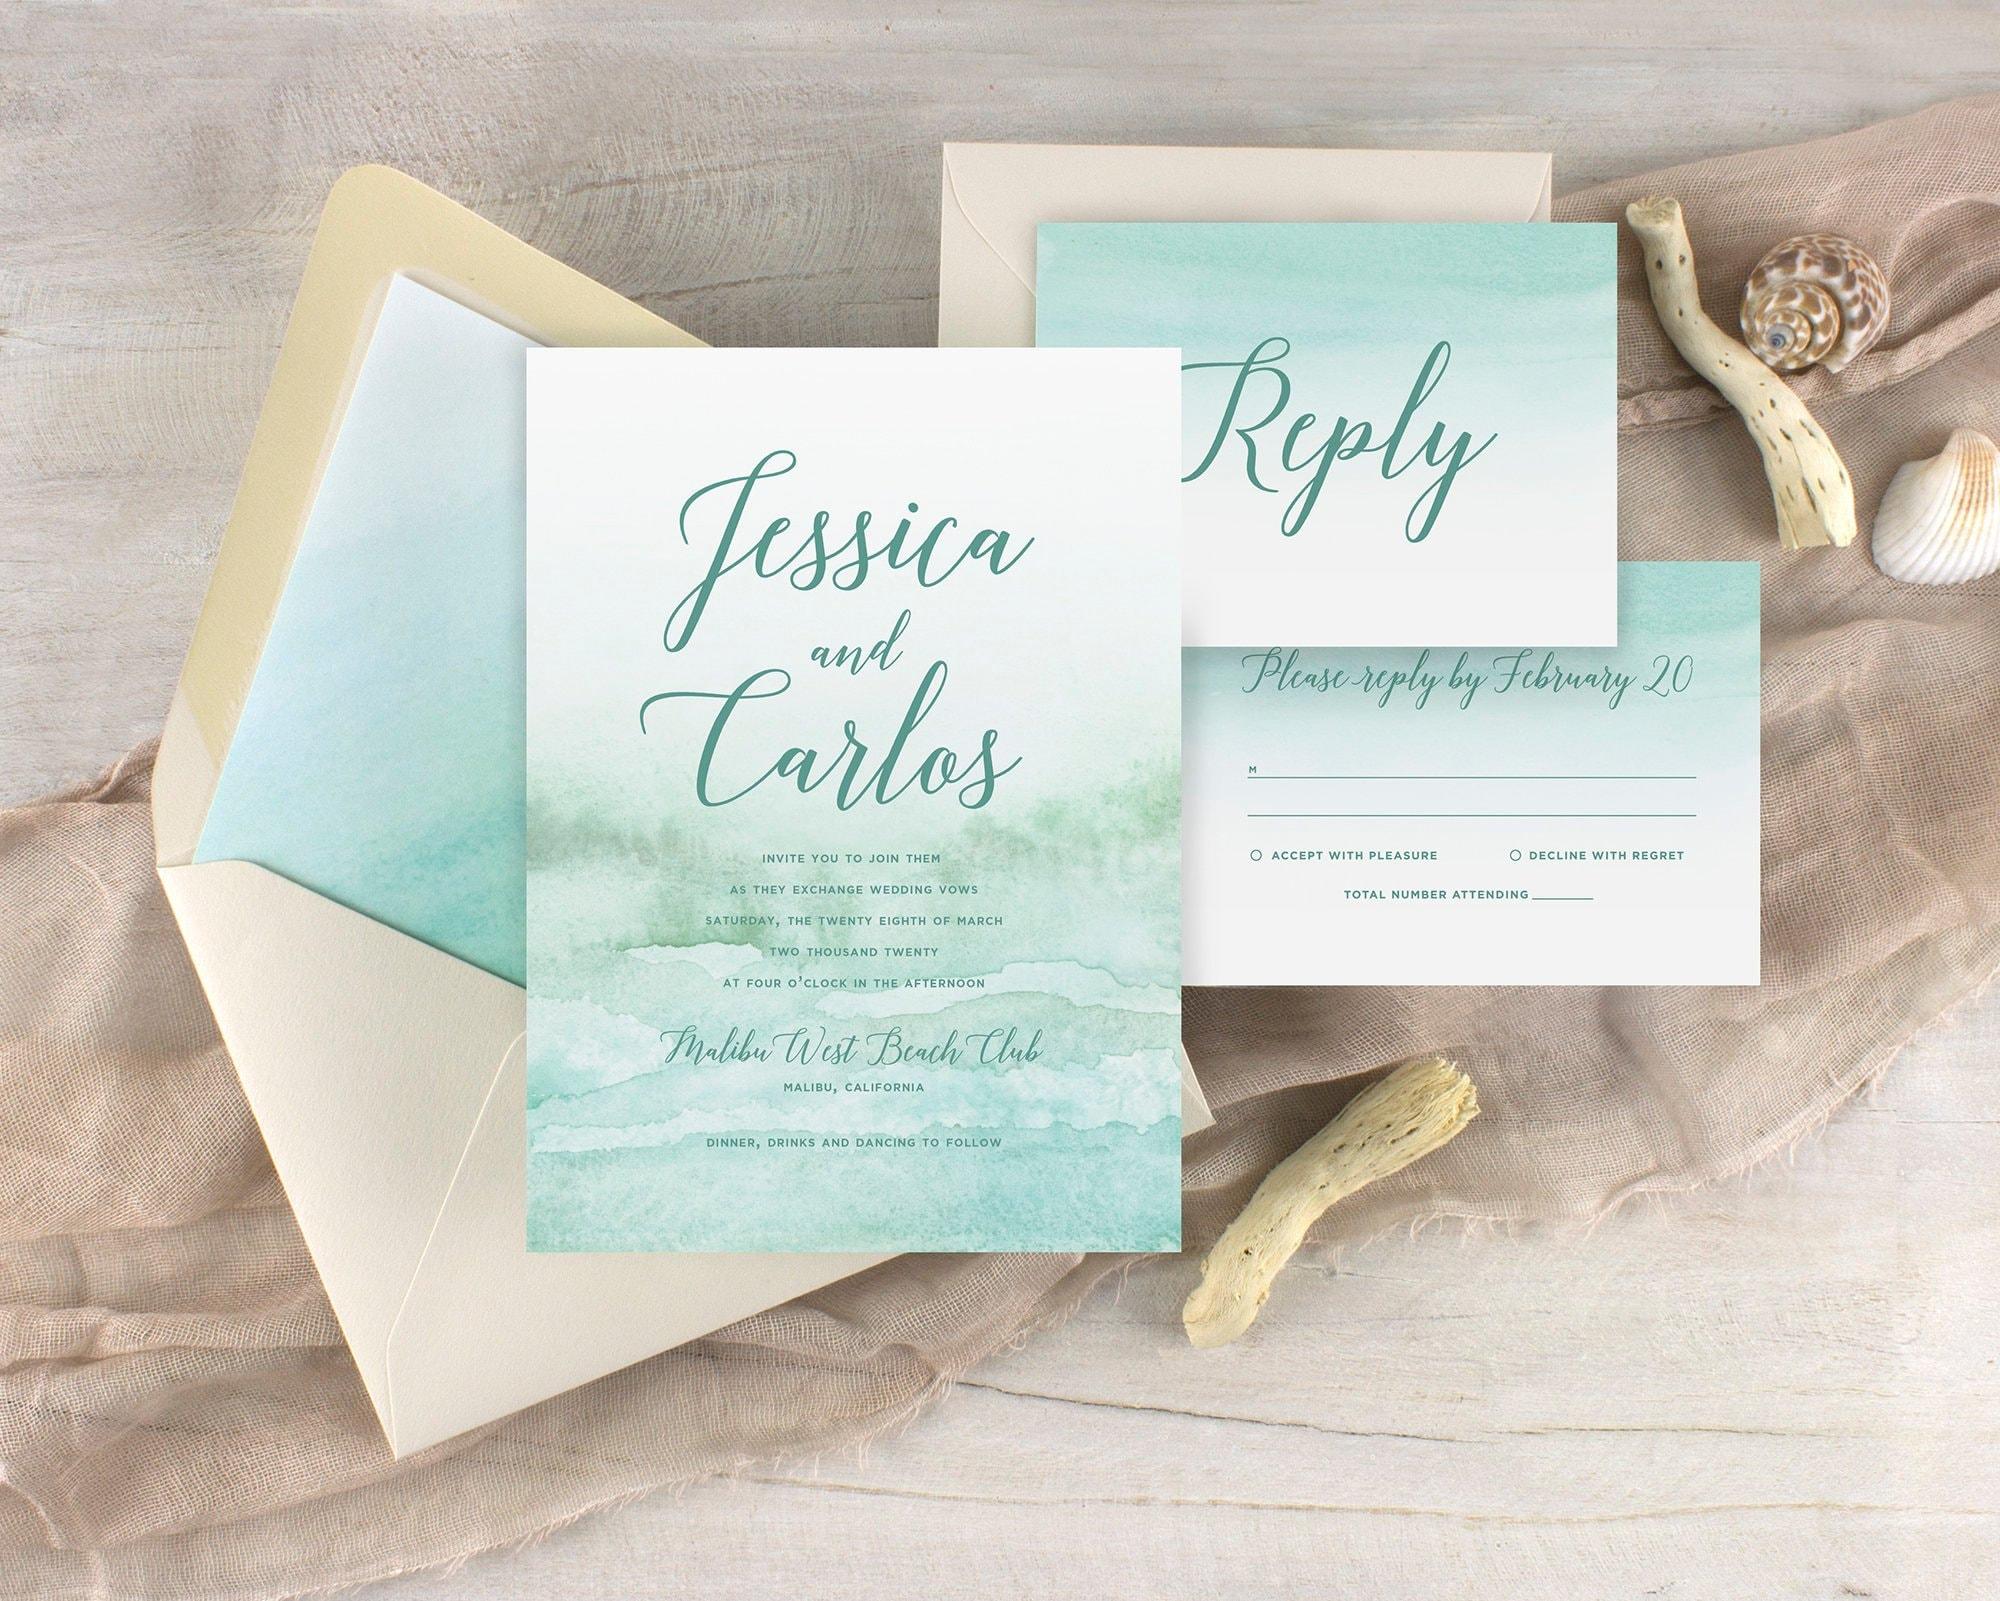 Destination Wedding Invitations Etsy: Beach Wedding Invitations Destination Wedding Invitations